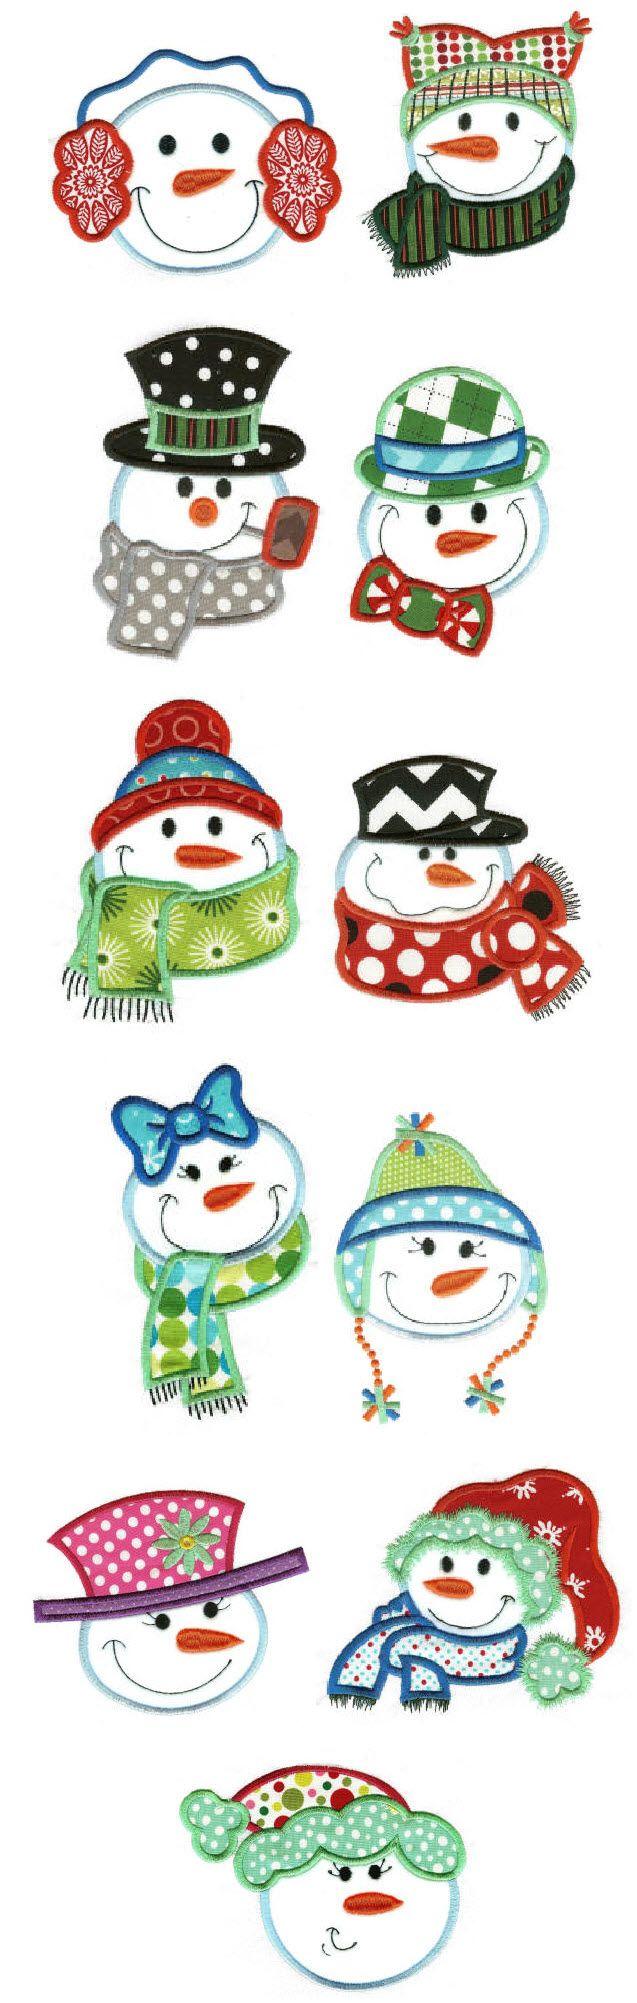 tolle kleine ideen f r winterliches kinderschminken n hen pinterest kinderschminken. Black Bedroom Furniture Sets. Home Design Ideas